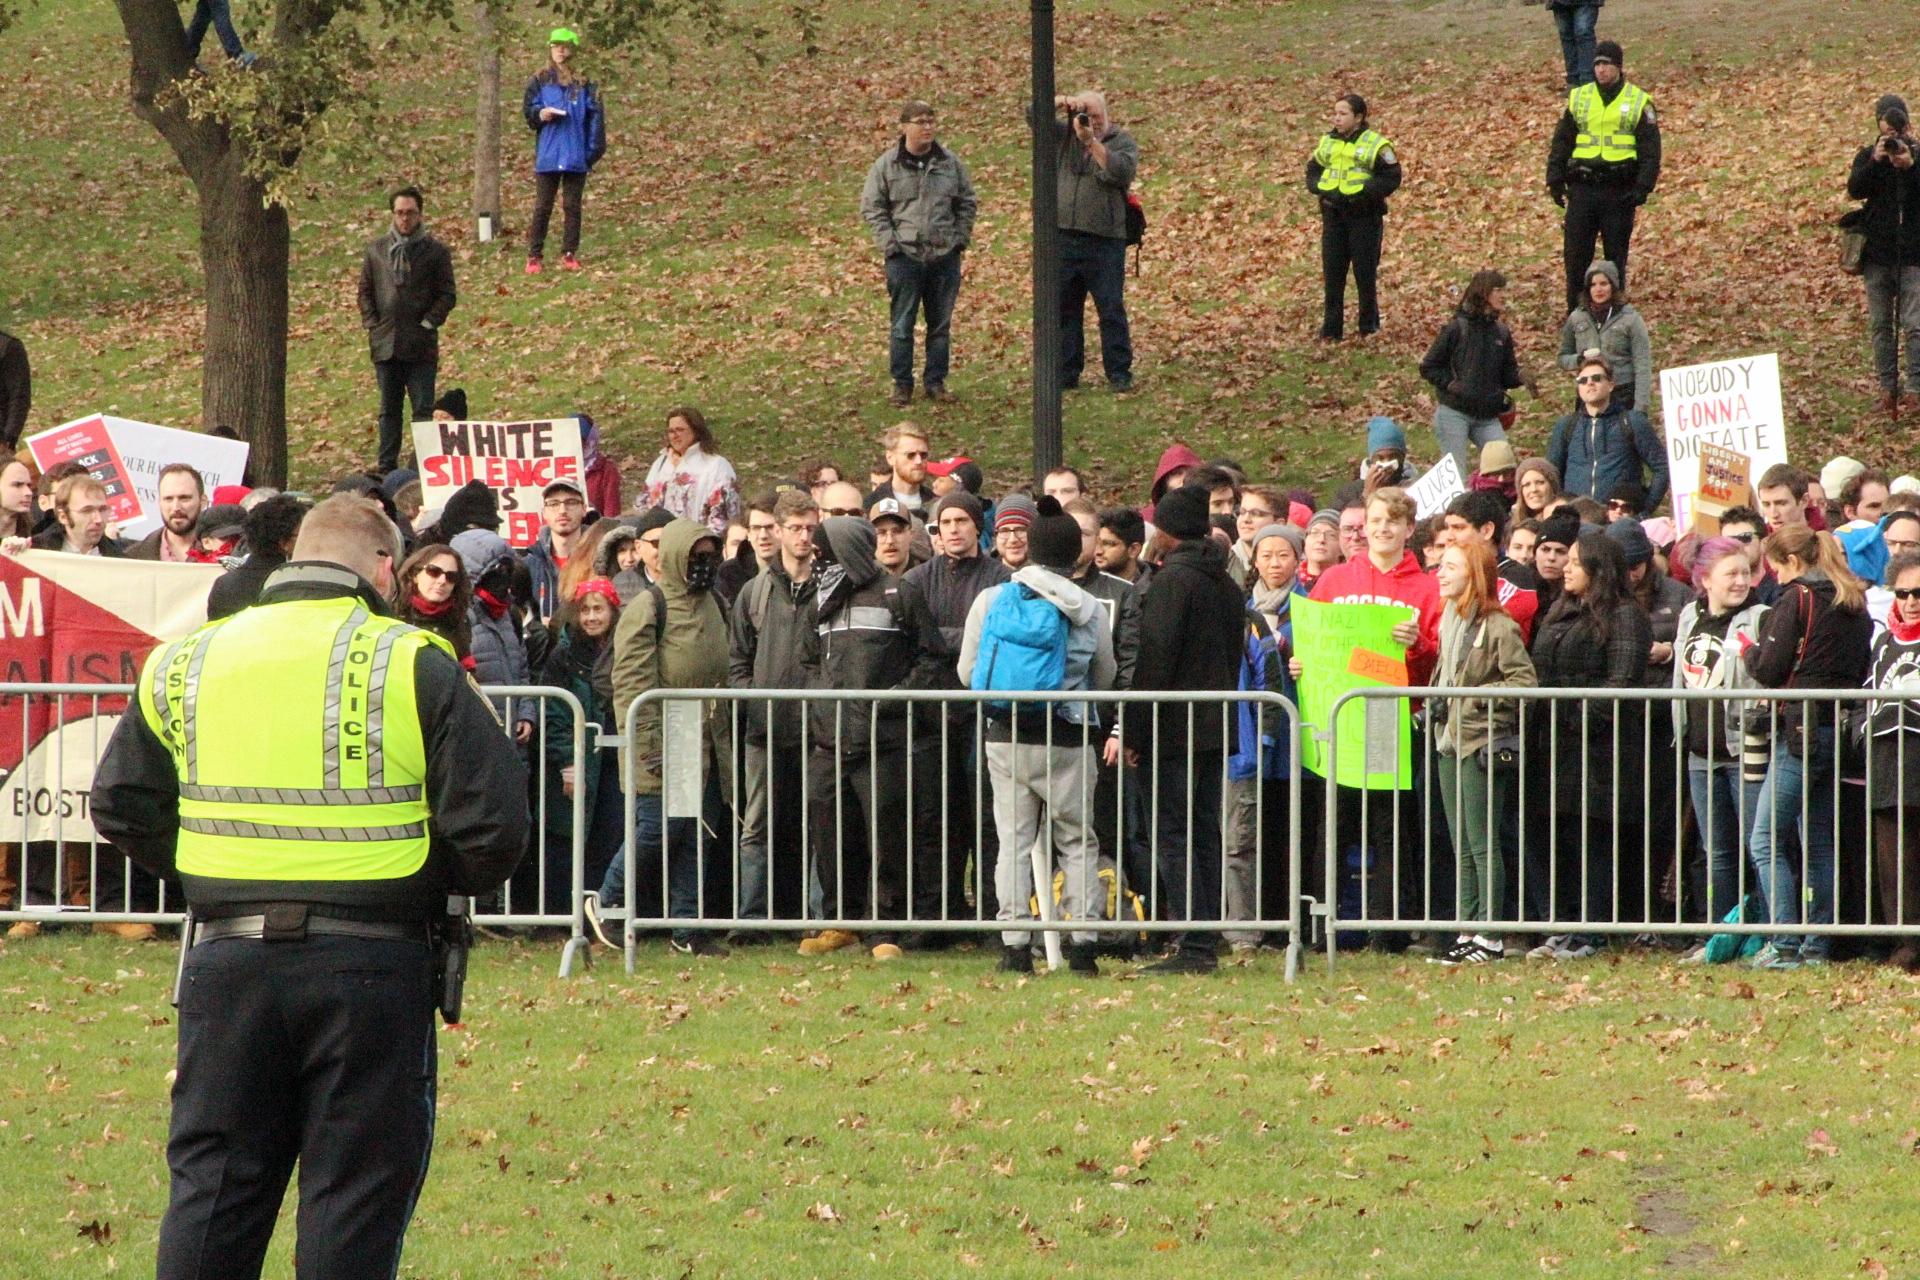 2017-11-18 Boston Common Free Speech Rally 01